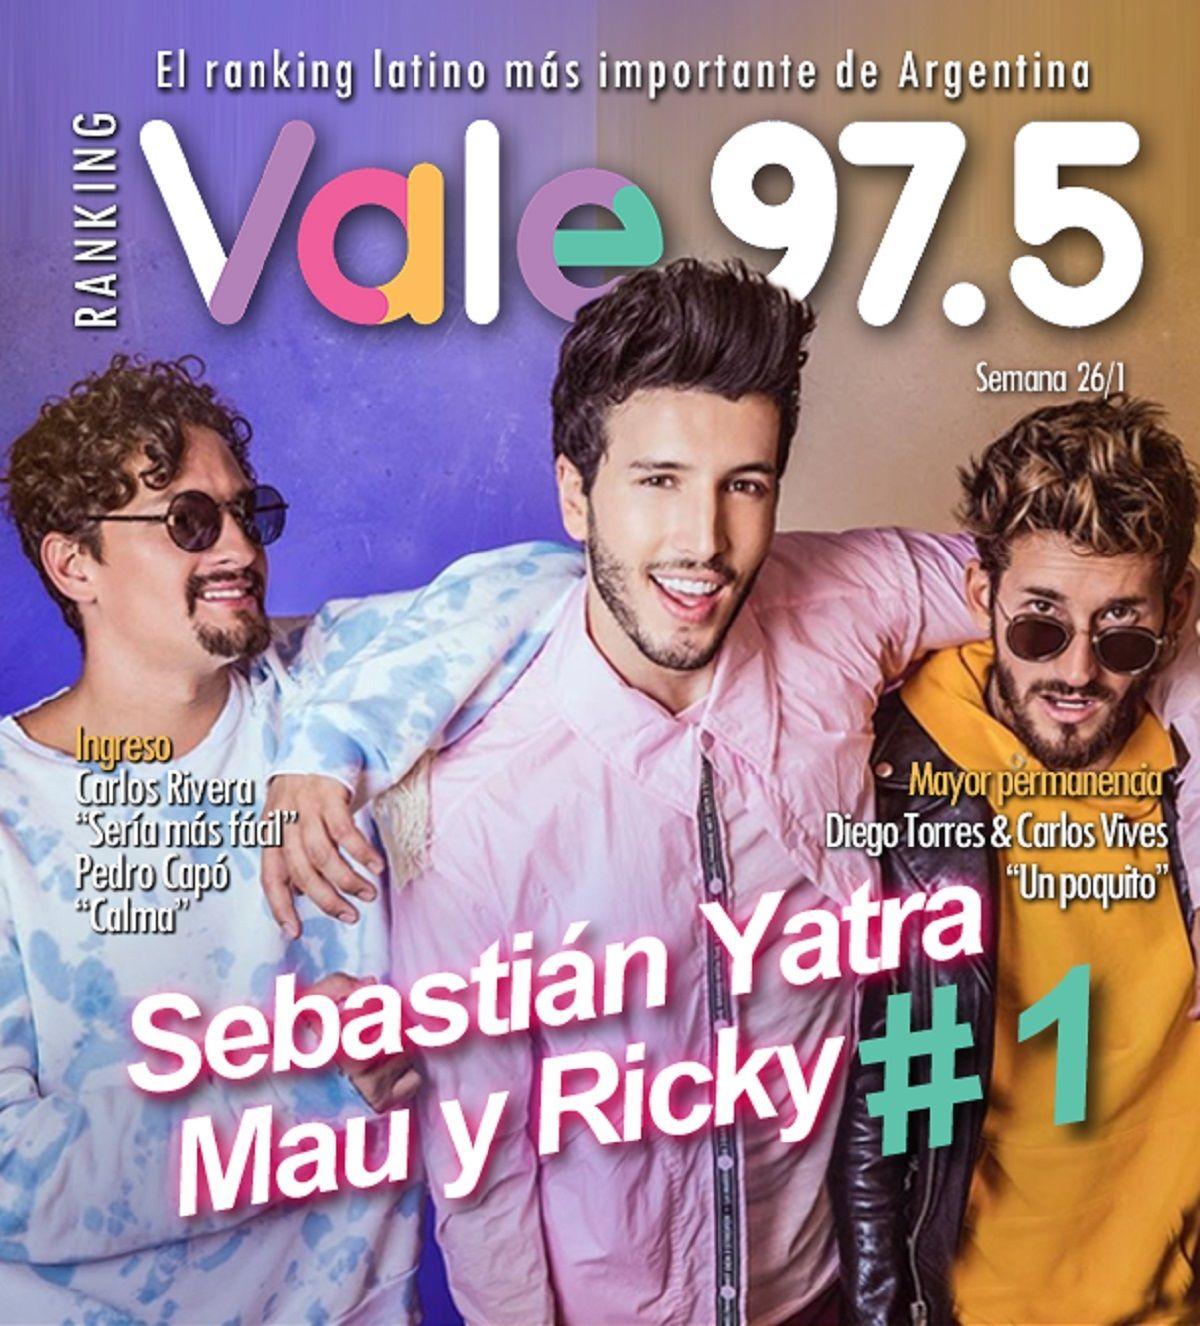 Sebastián Yatra llegó a la cima del Ranking Vale